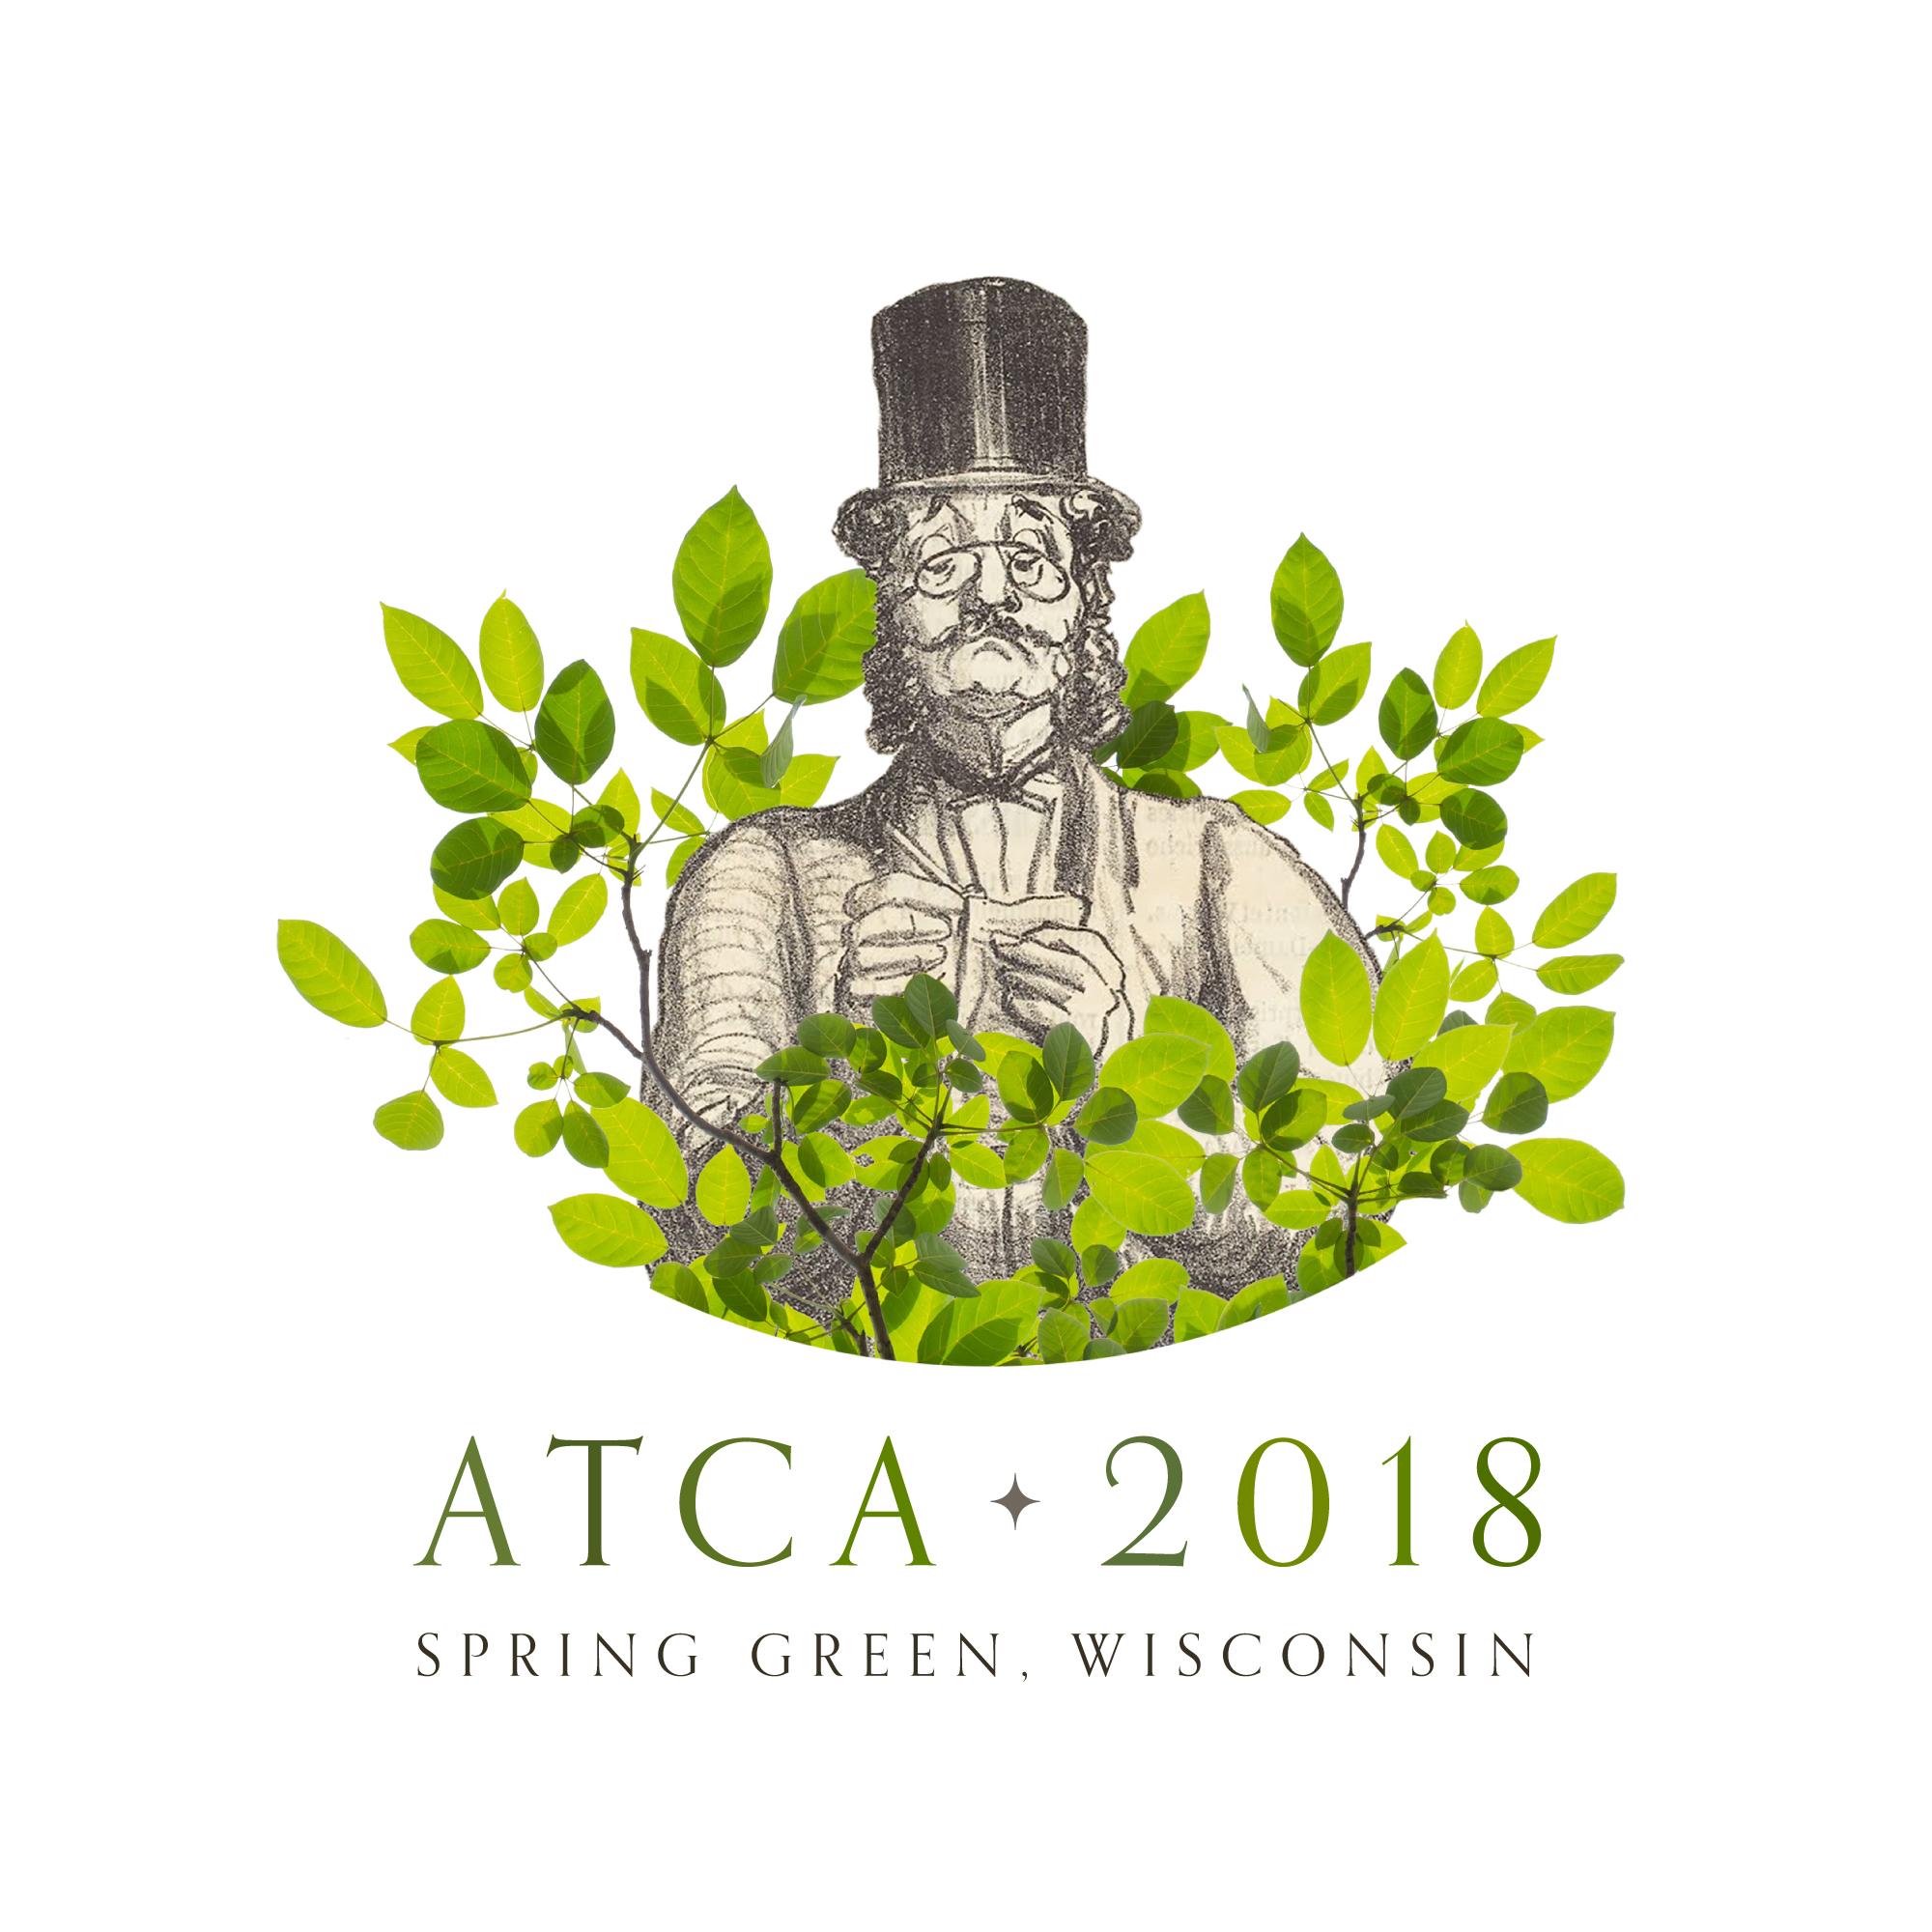 atca-conference-logo-web.jpg